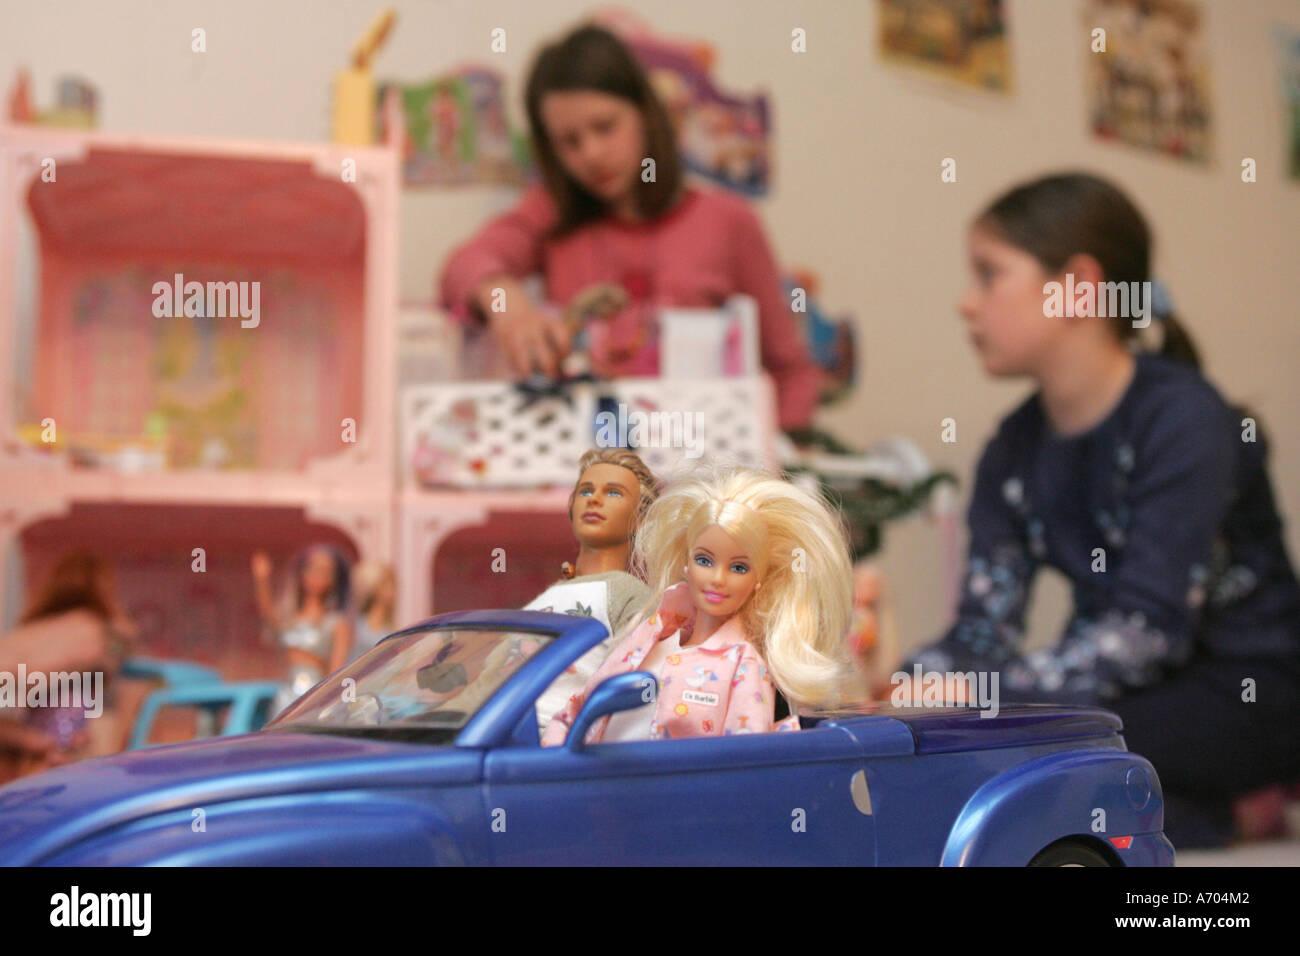 08.04.2005, DEU, Marlena (11) and Leonie (8) plays with Barbie dolls - Stock Image